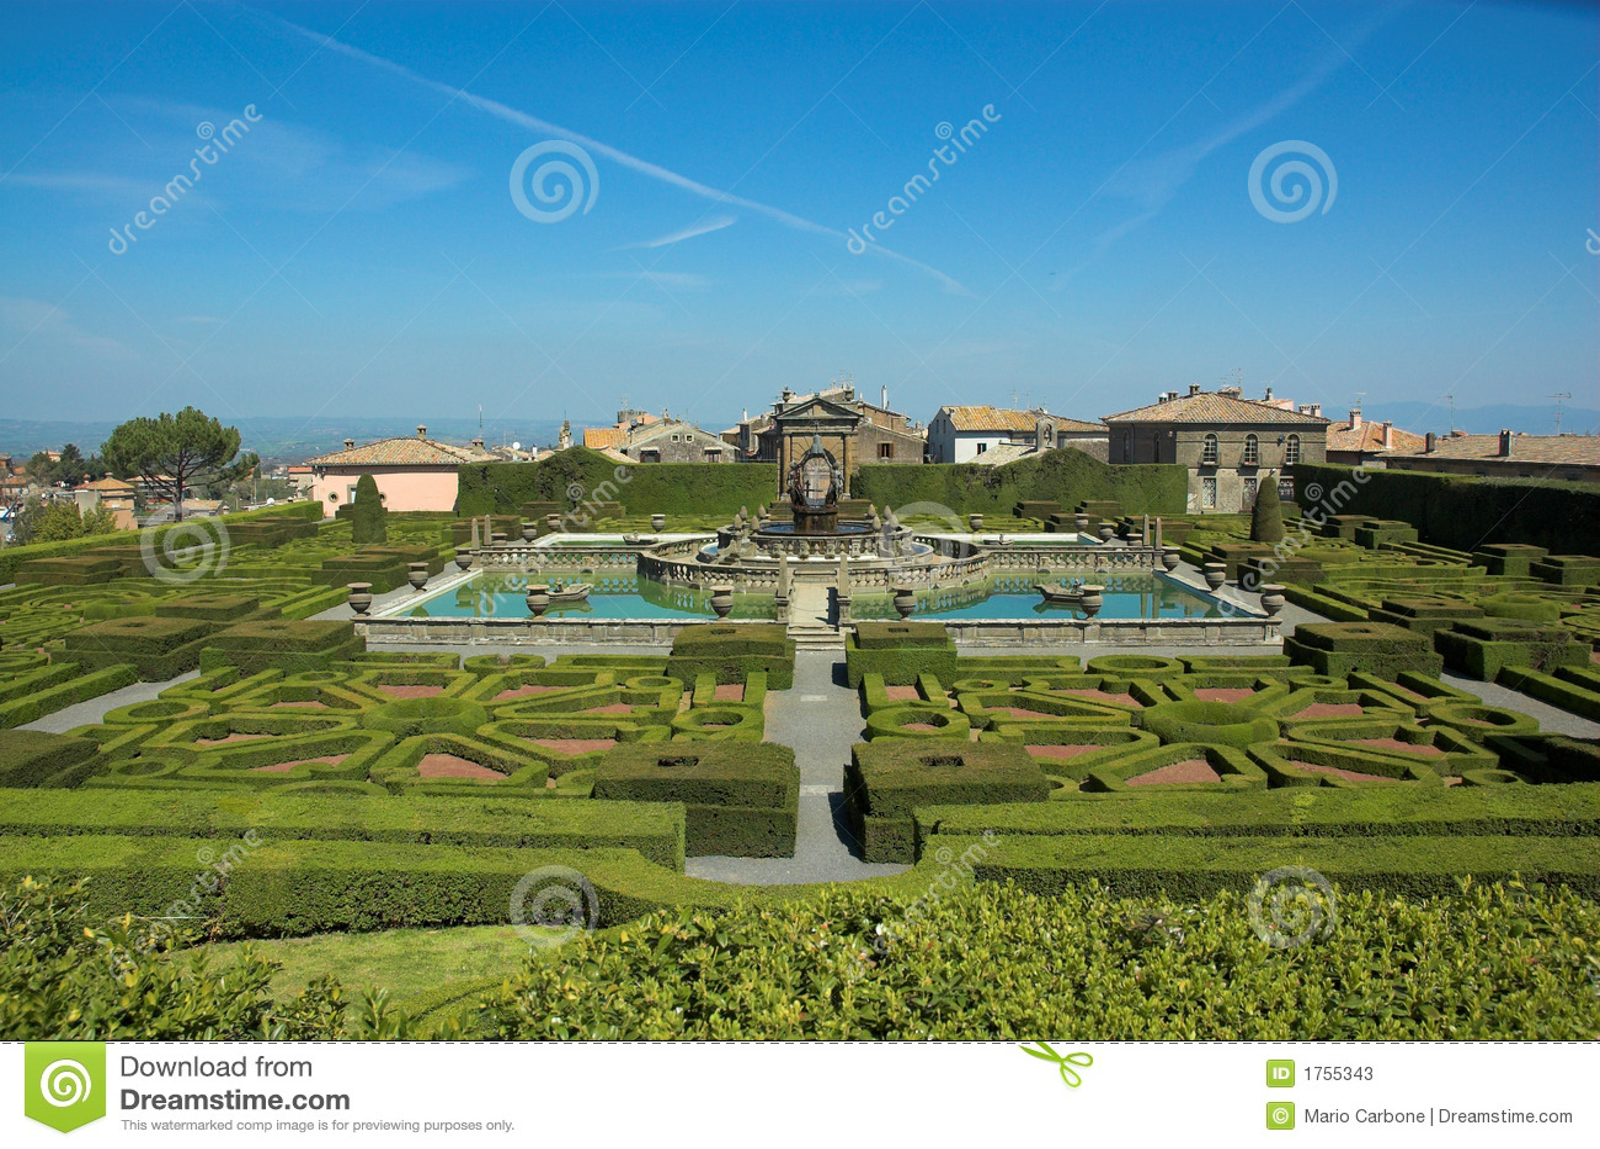 Villa Lante, jardins italiens